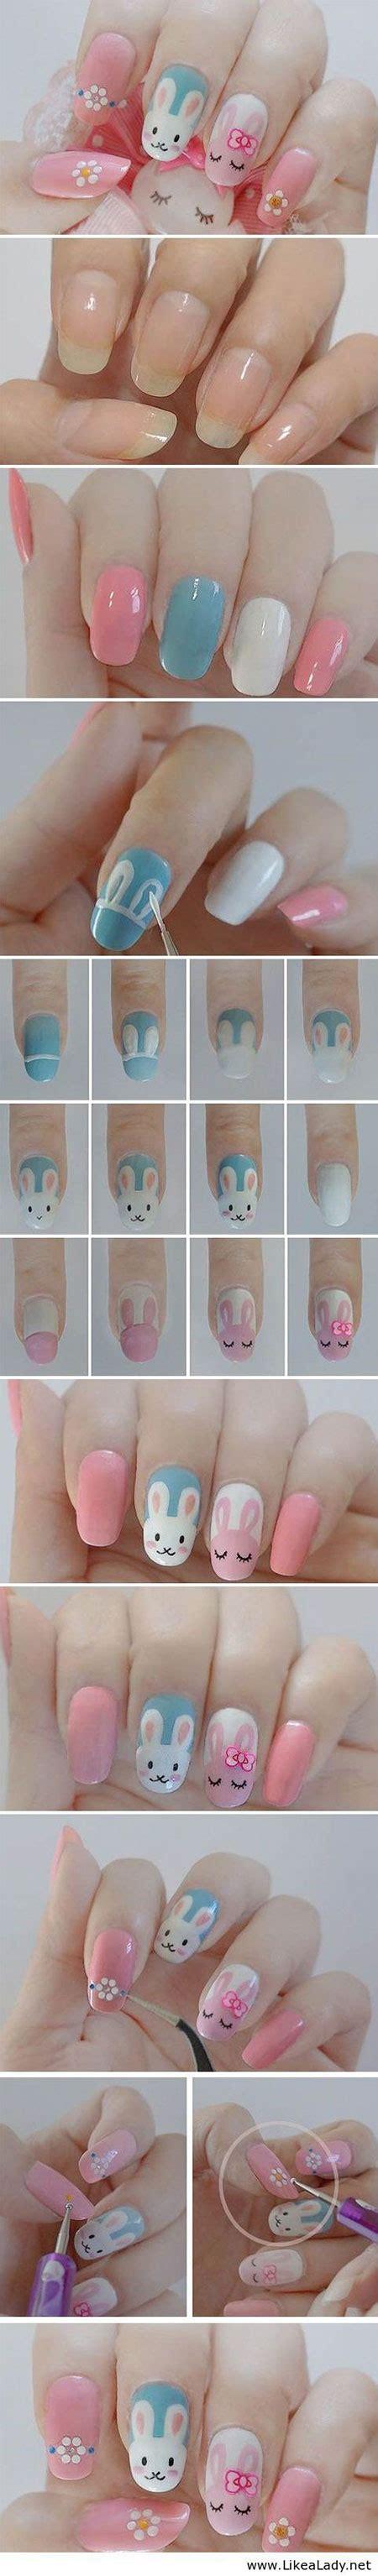 tutorial nail art elegant elegant easter nail art tutorials for beginners learners